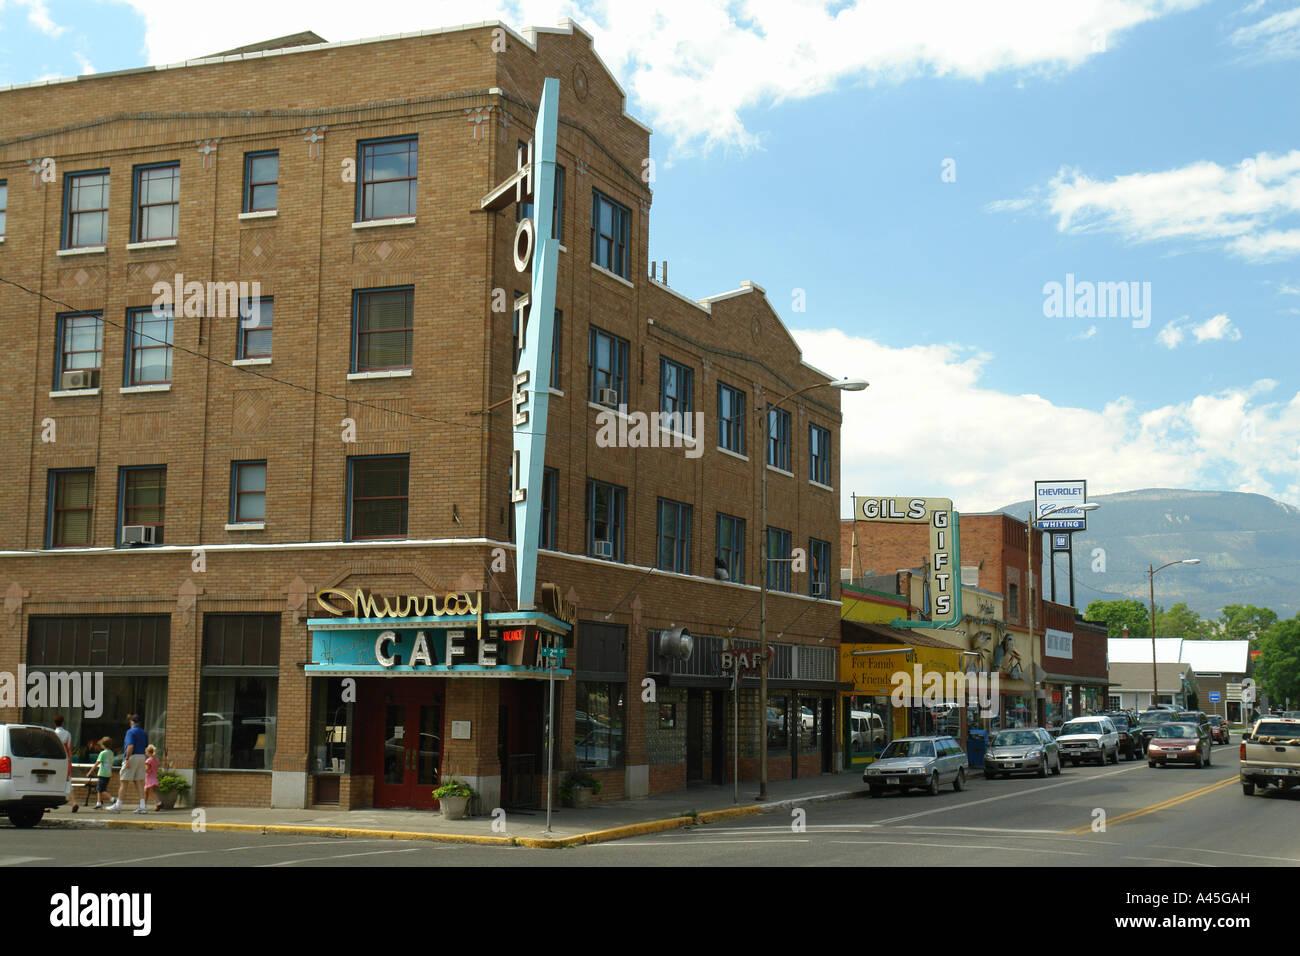 AJD57069, Livingston, MT, Montana, downtown - Stock Image